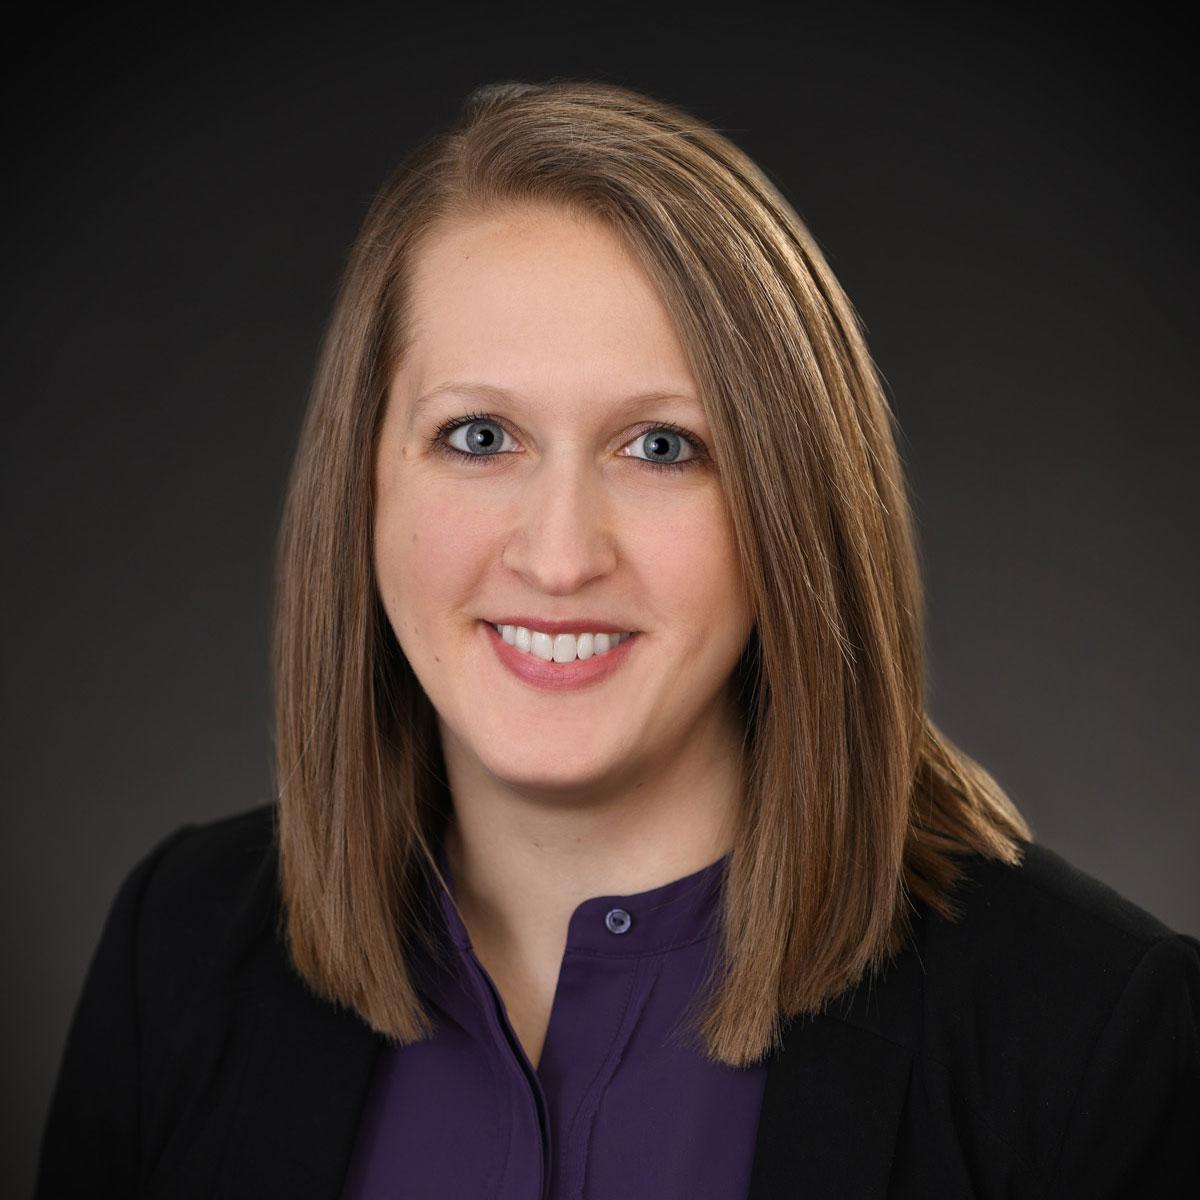 Dr. Jessica McCullen